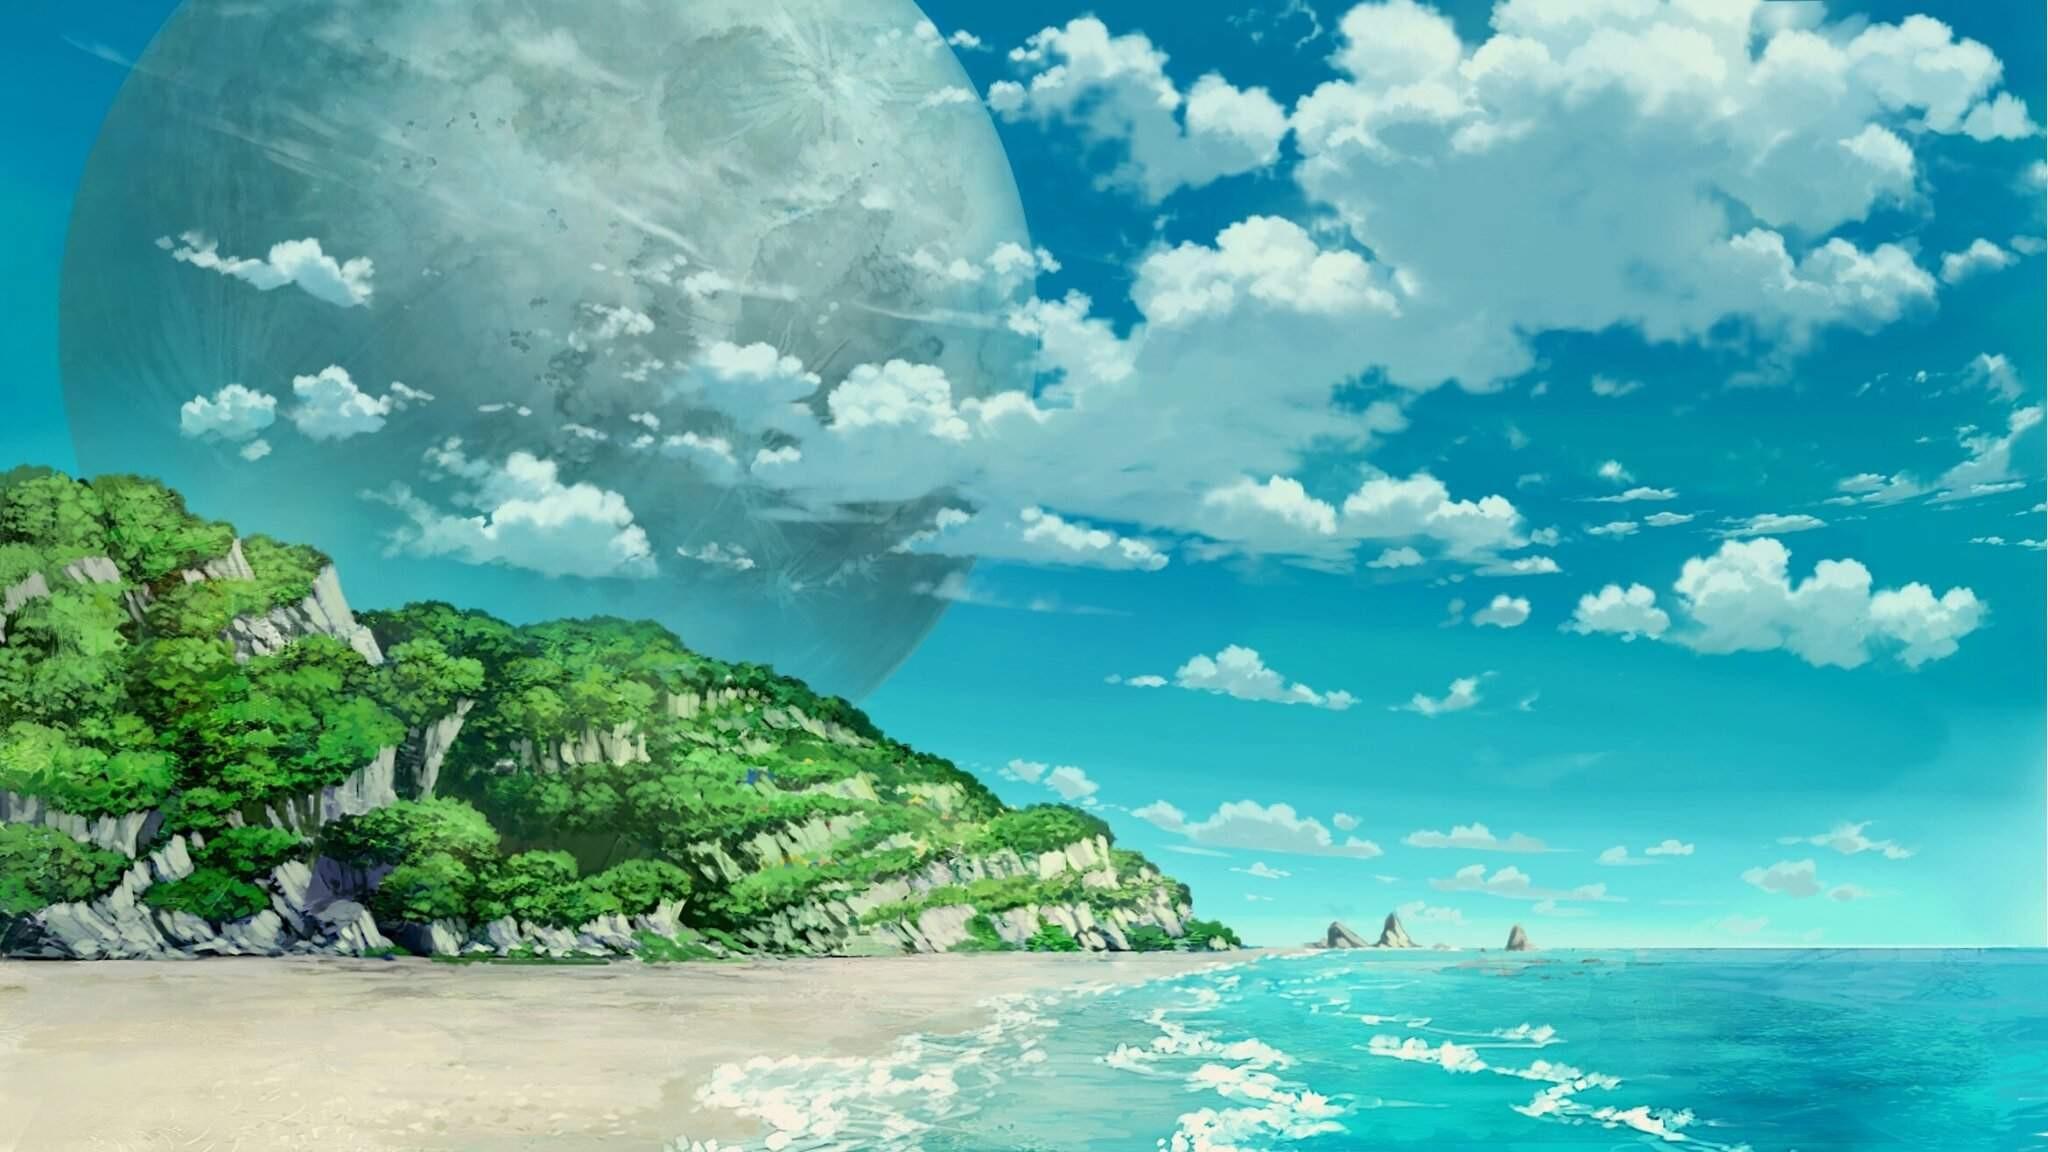 Anime Cloud free hd wallpaper